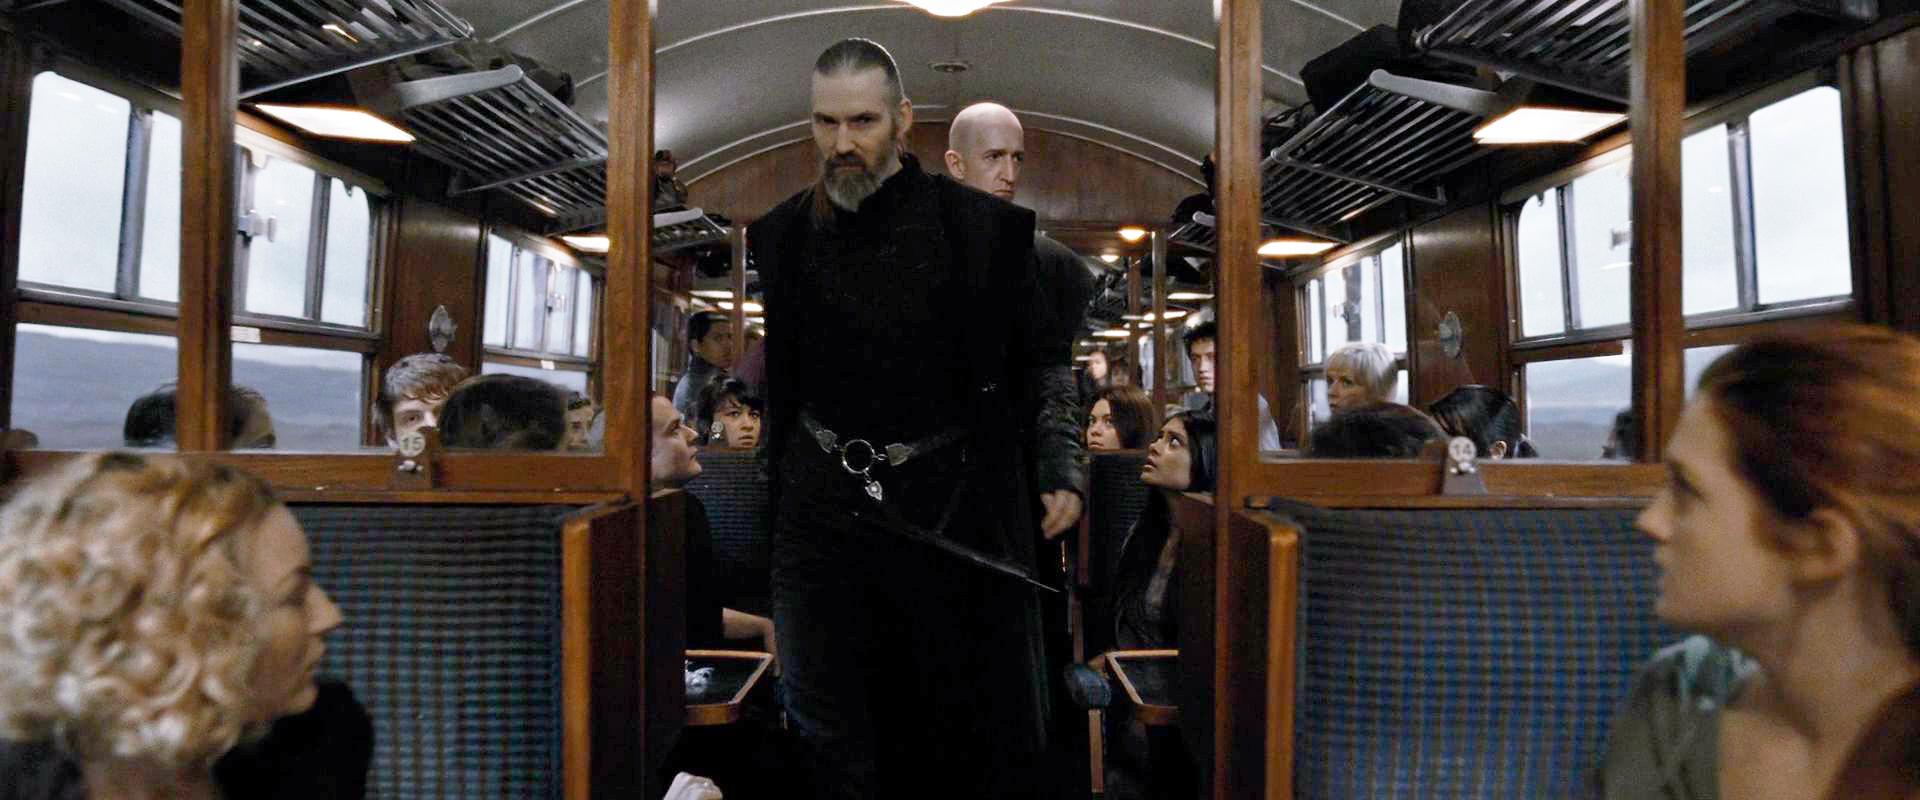 DH1 Death Eaters inside Hogwarts Express 02.jpg